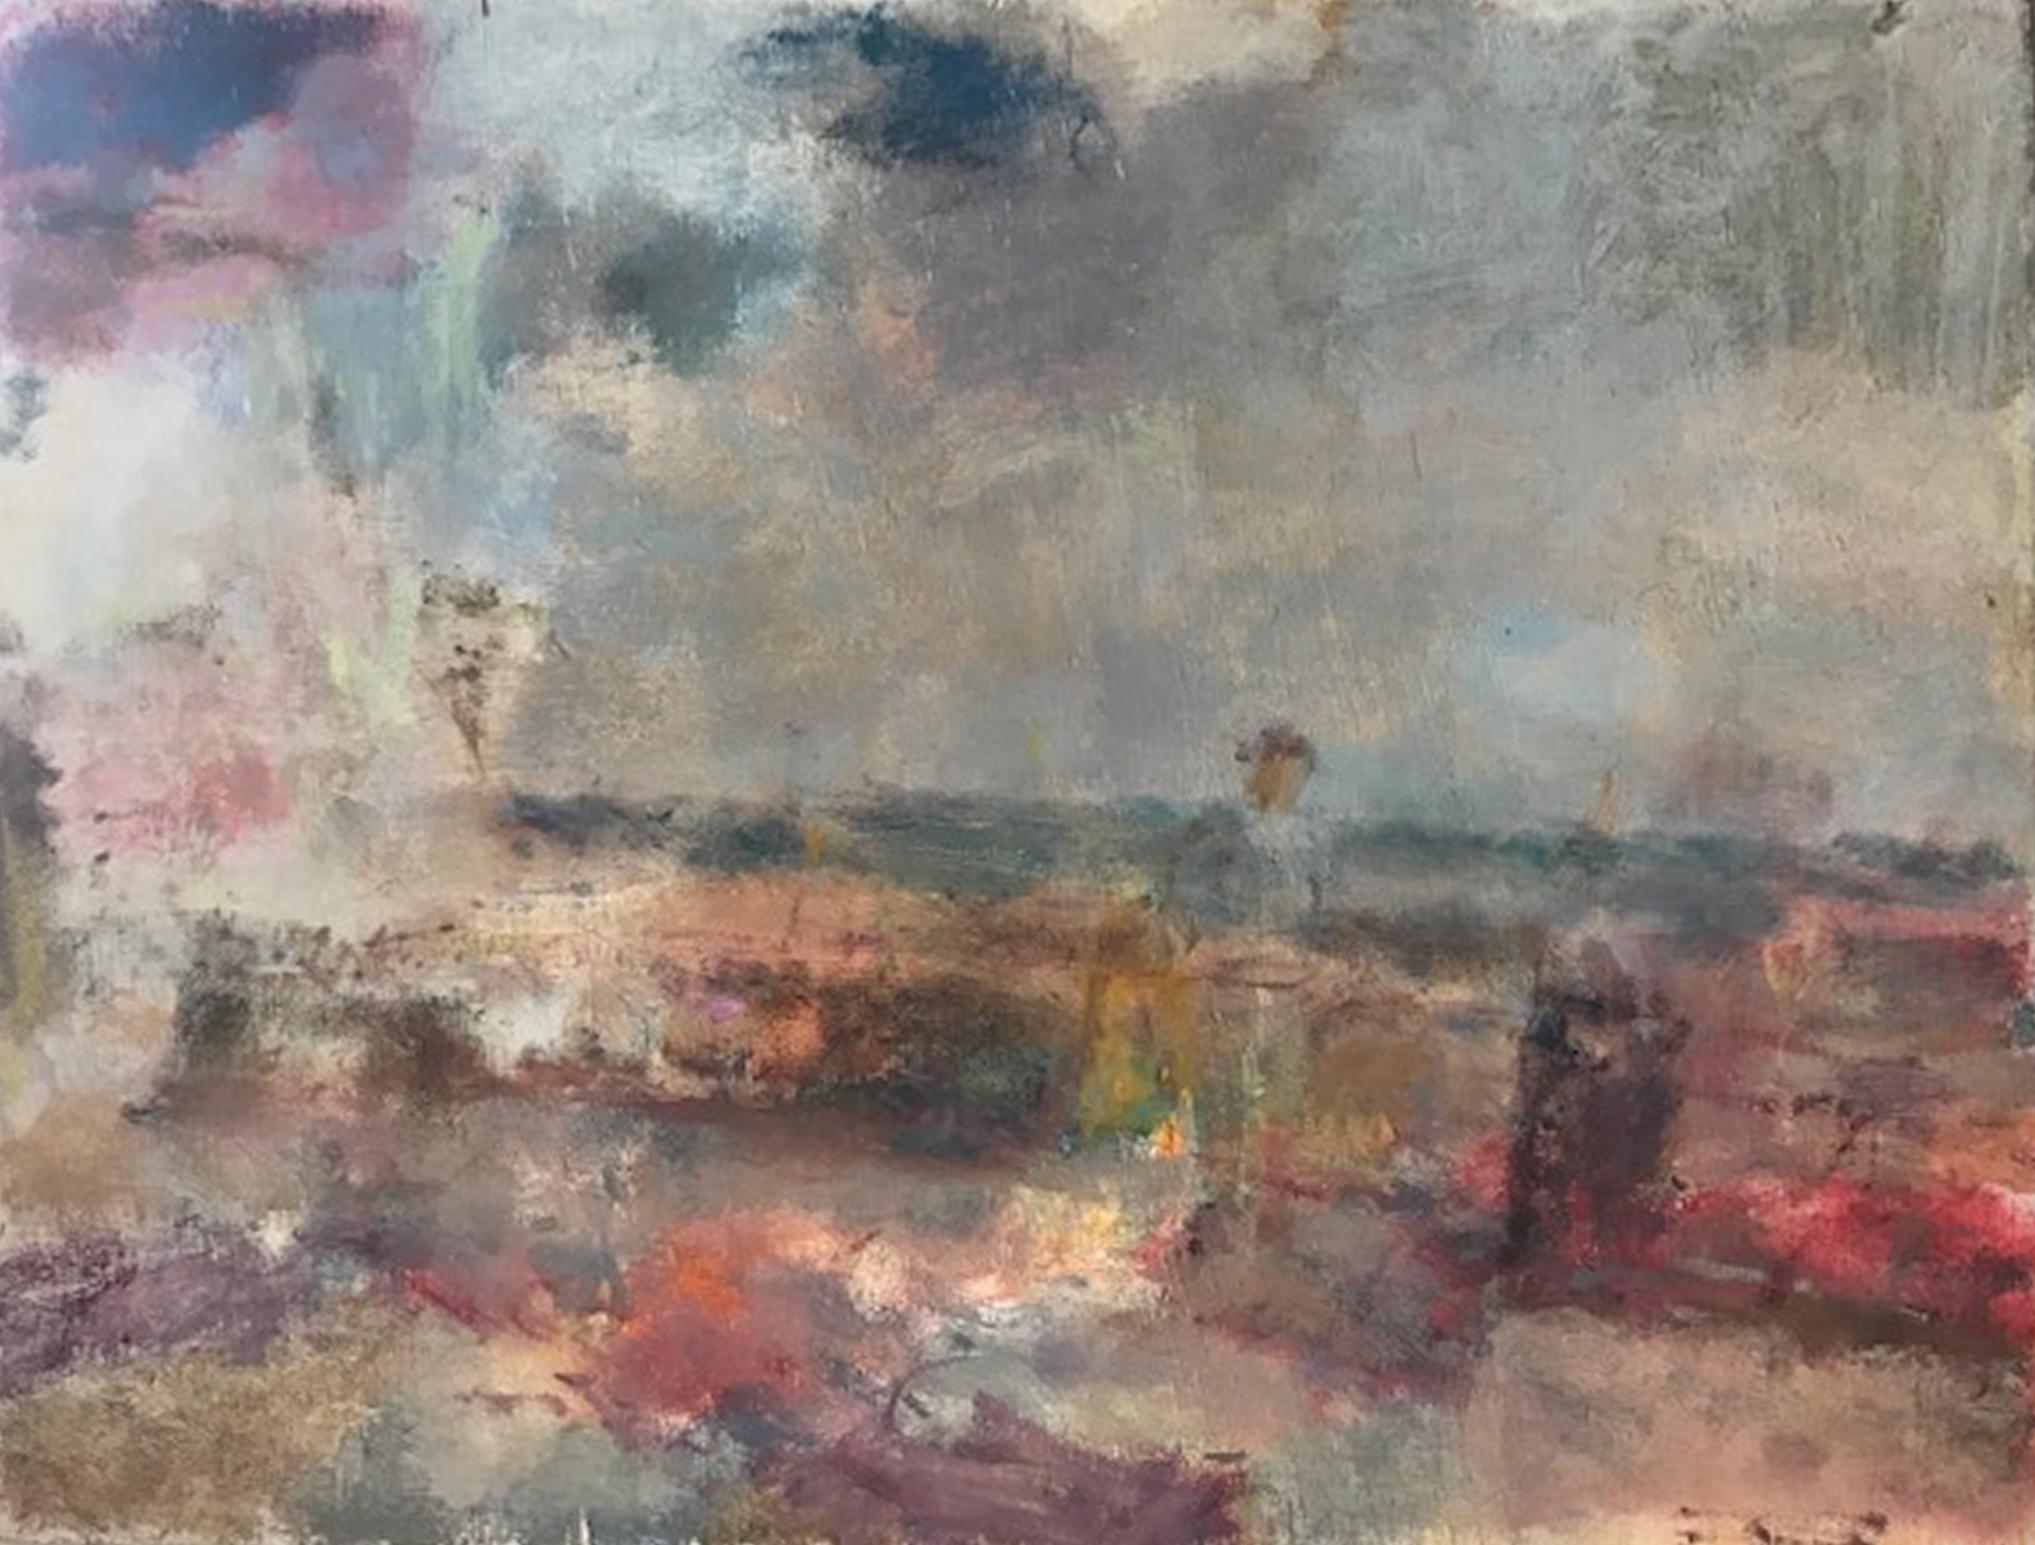 Artist: Anja Niedring  Title: Saltdean with Figure  Size: 26 x 34 cm  Medium: Oil on board  Price: £580